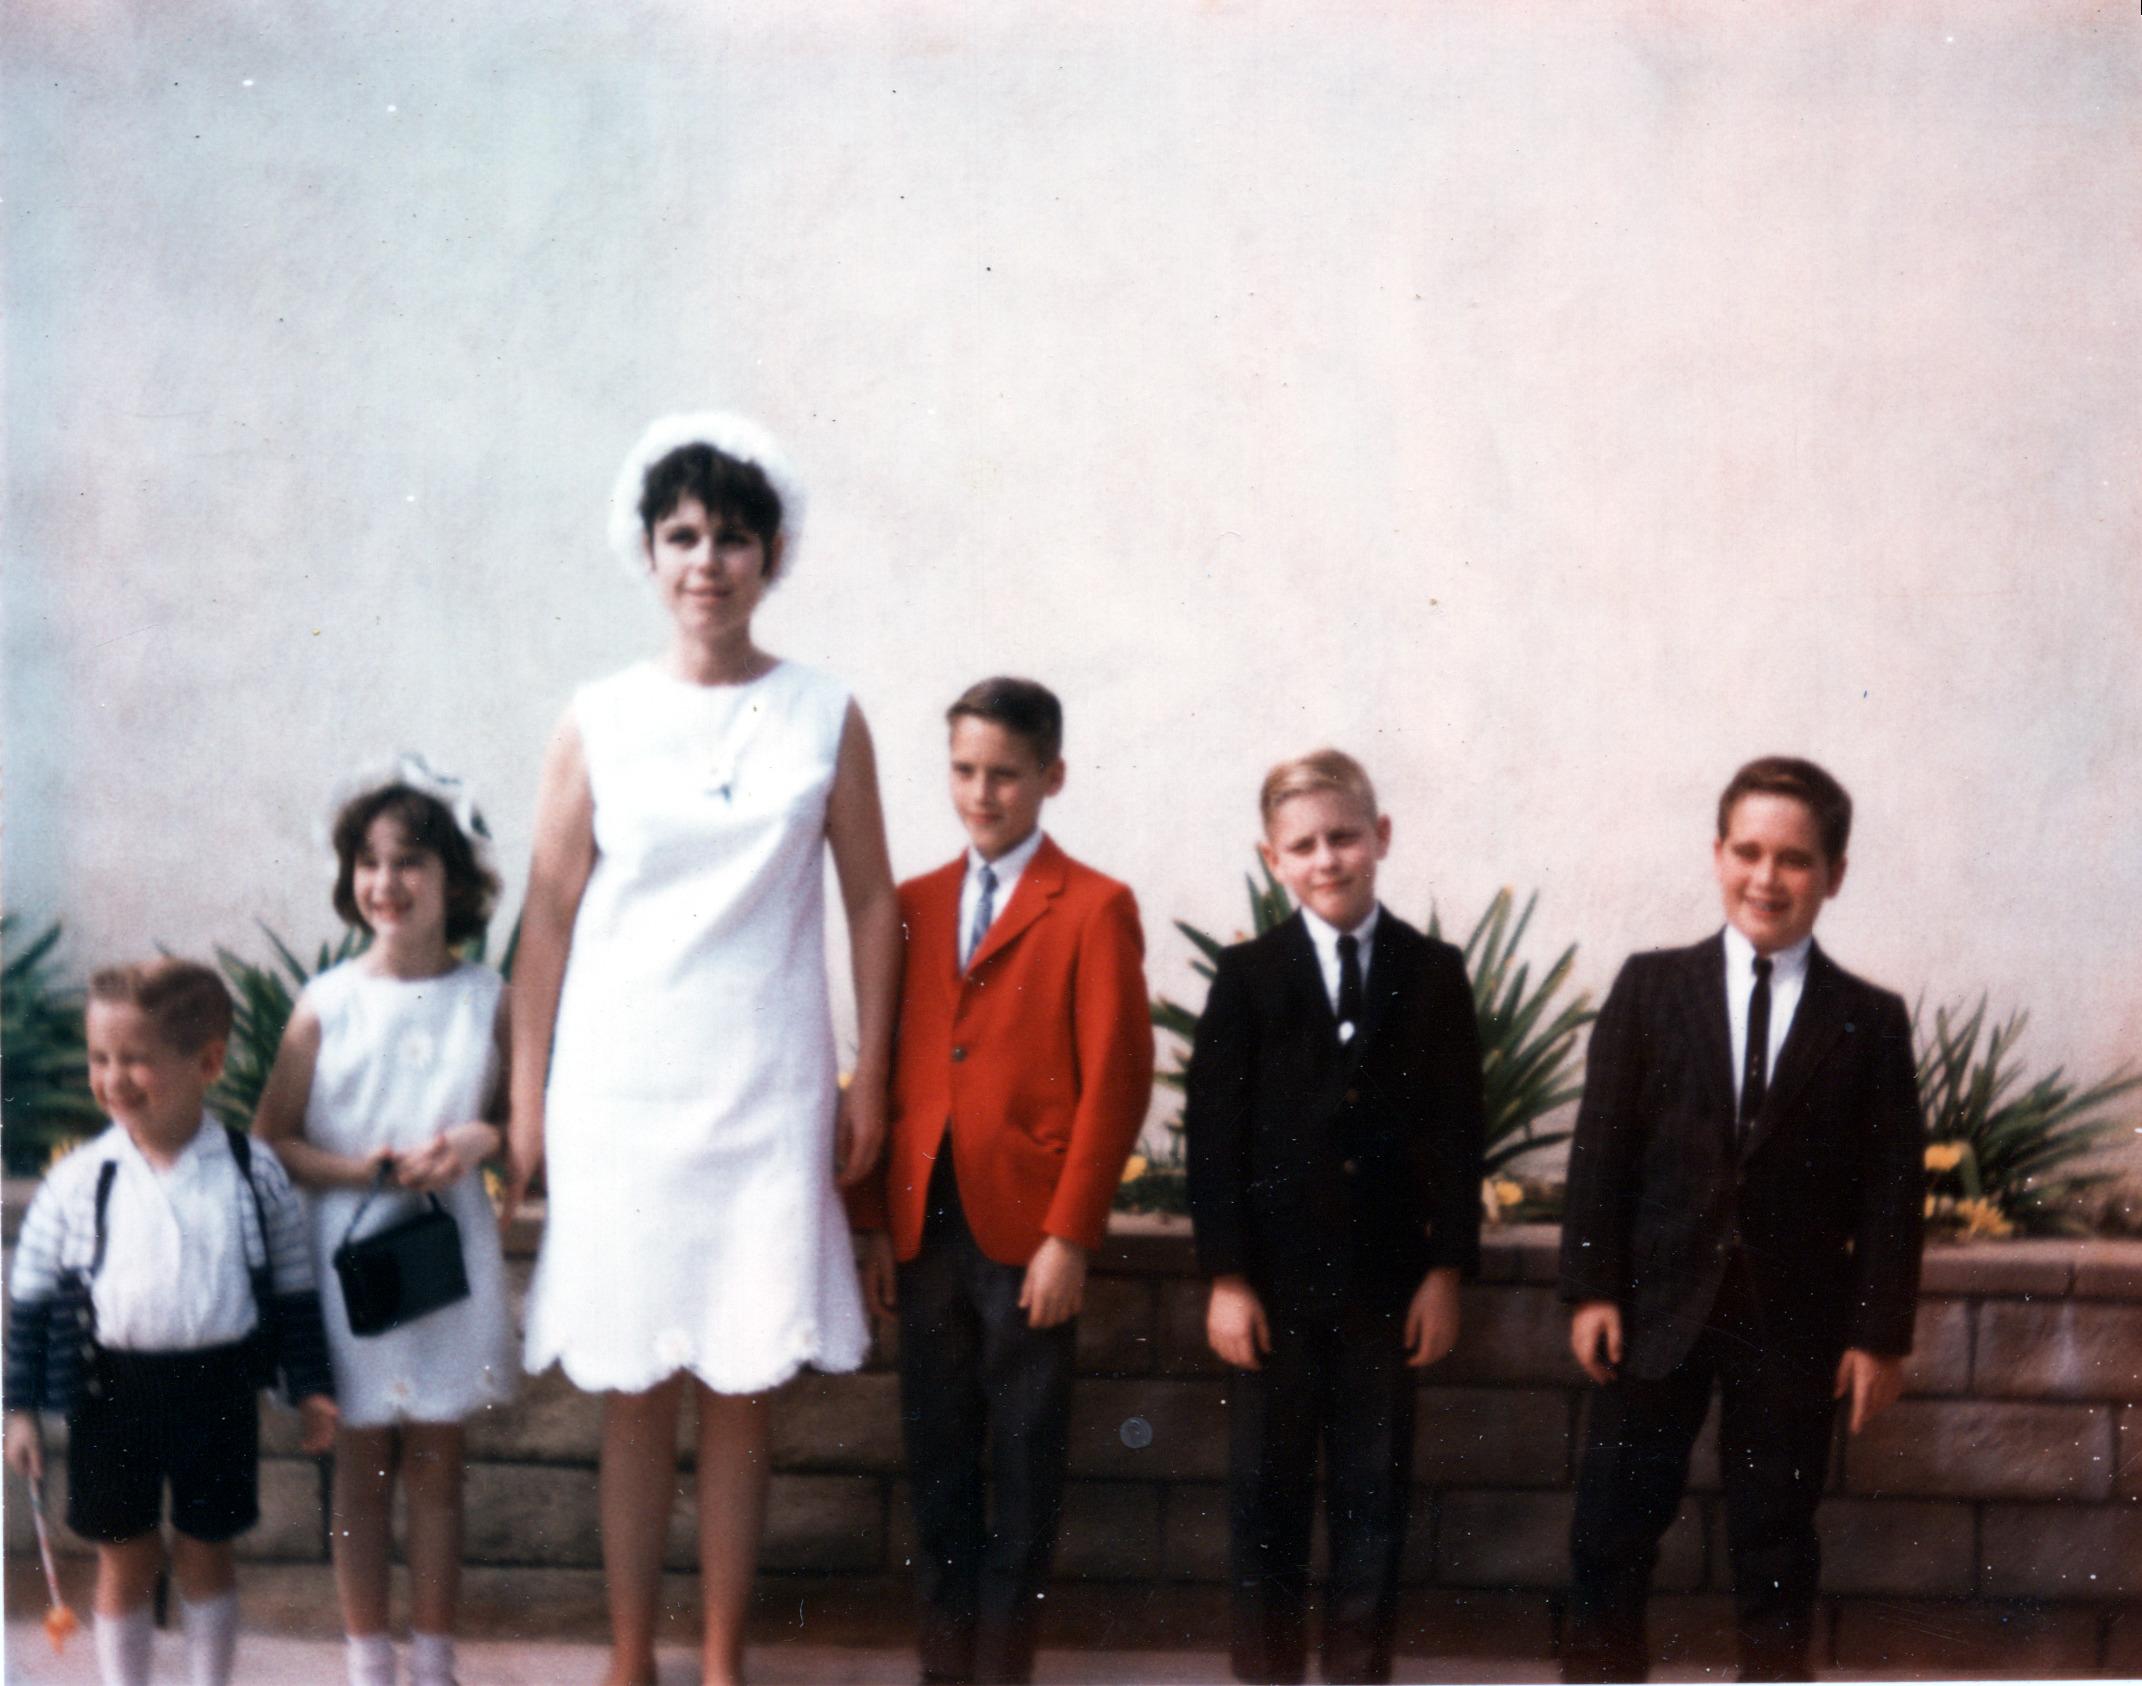 Easter - Roger, Kim, Mom, Mark, Terry & Buddy